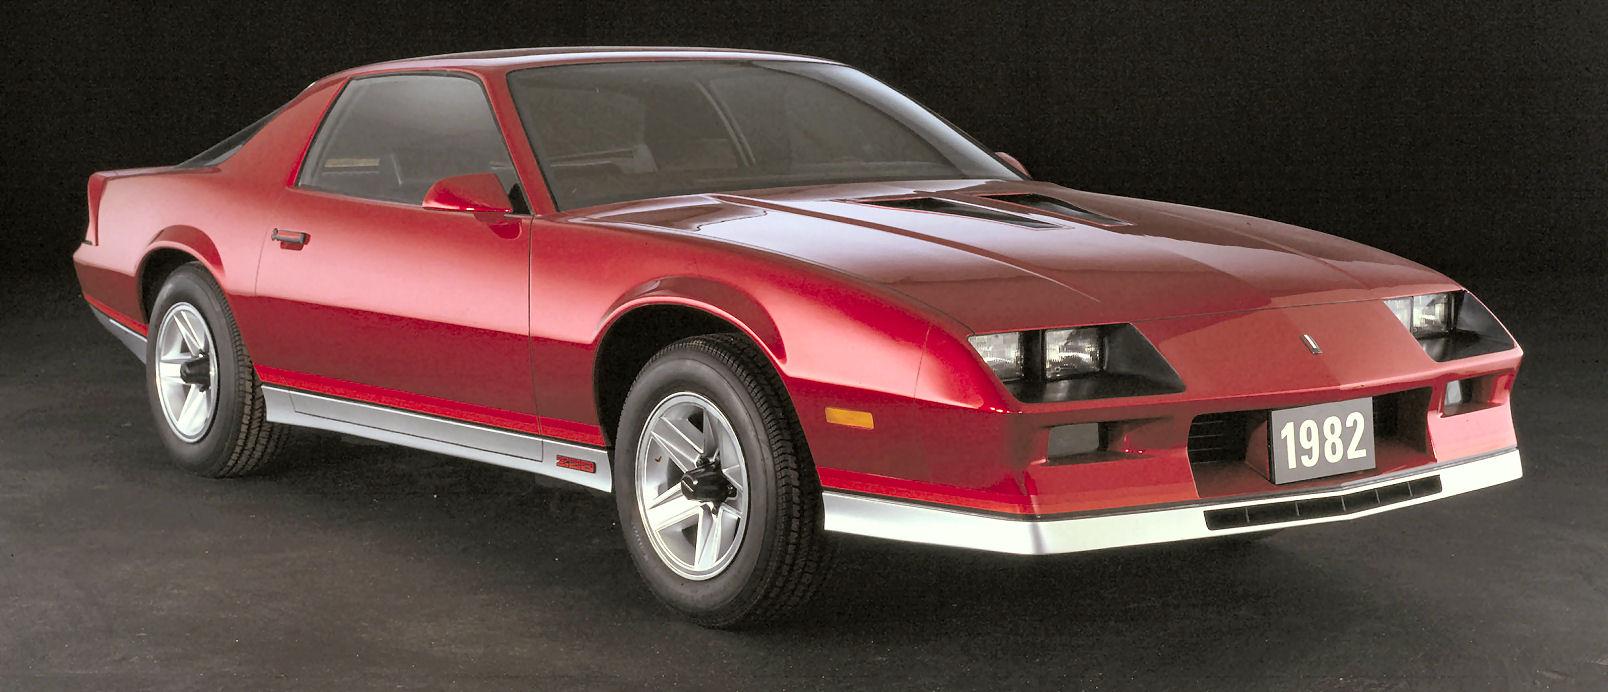 Chevrolet-Camaro-3rd-generation-1982